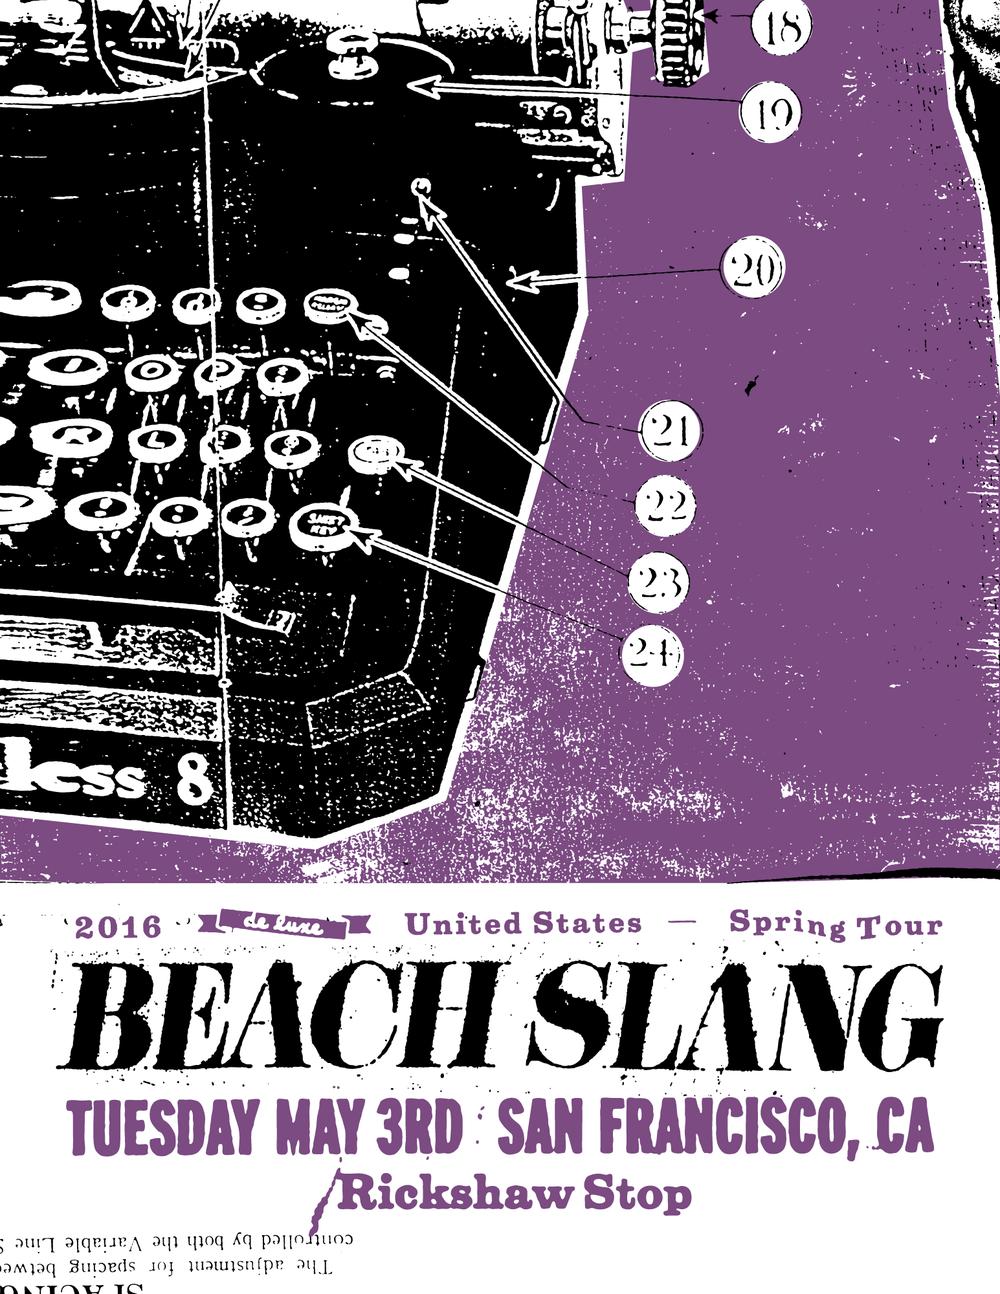 BeachSlang_5-03_SanFrancisco_r1.png